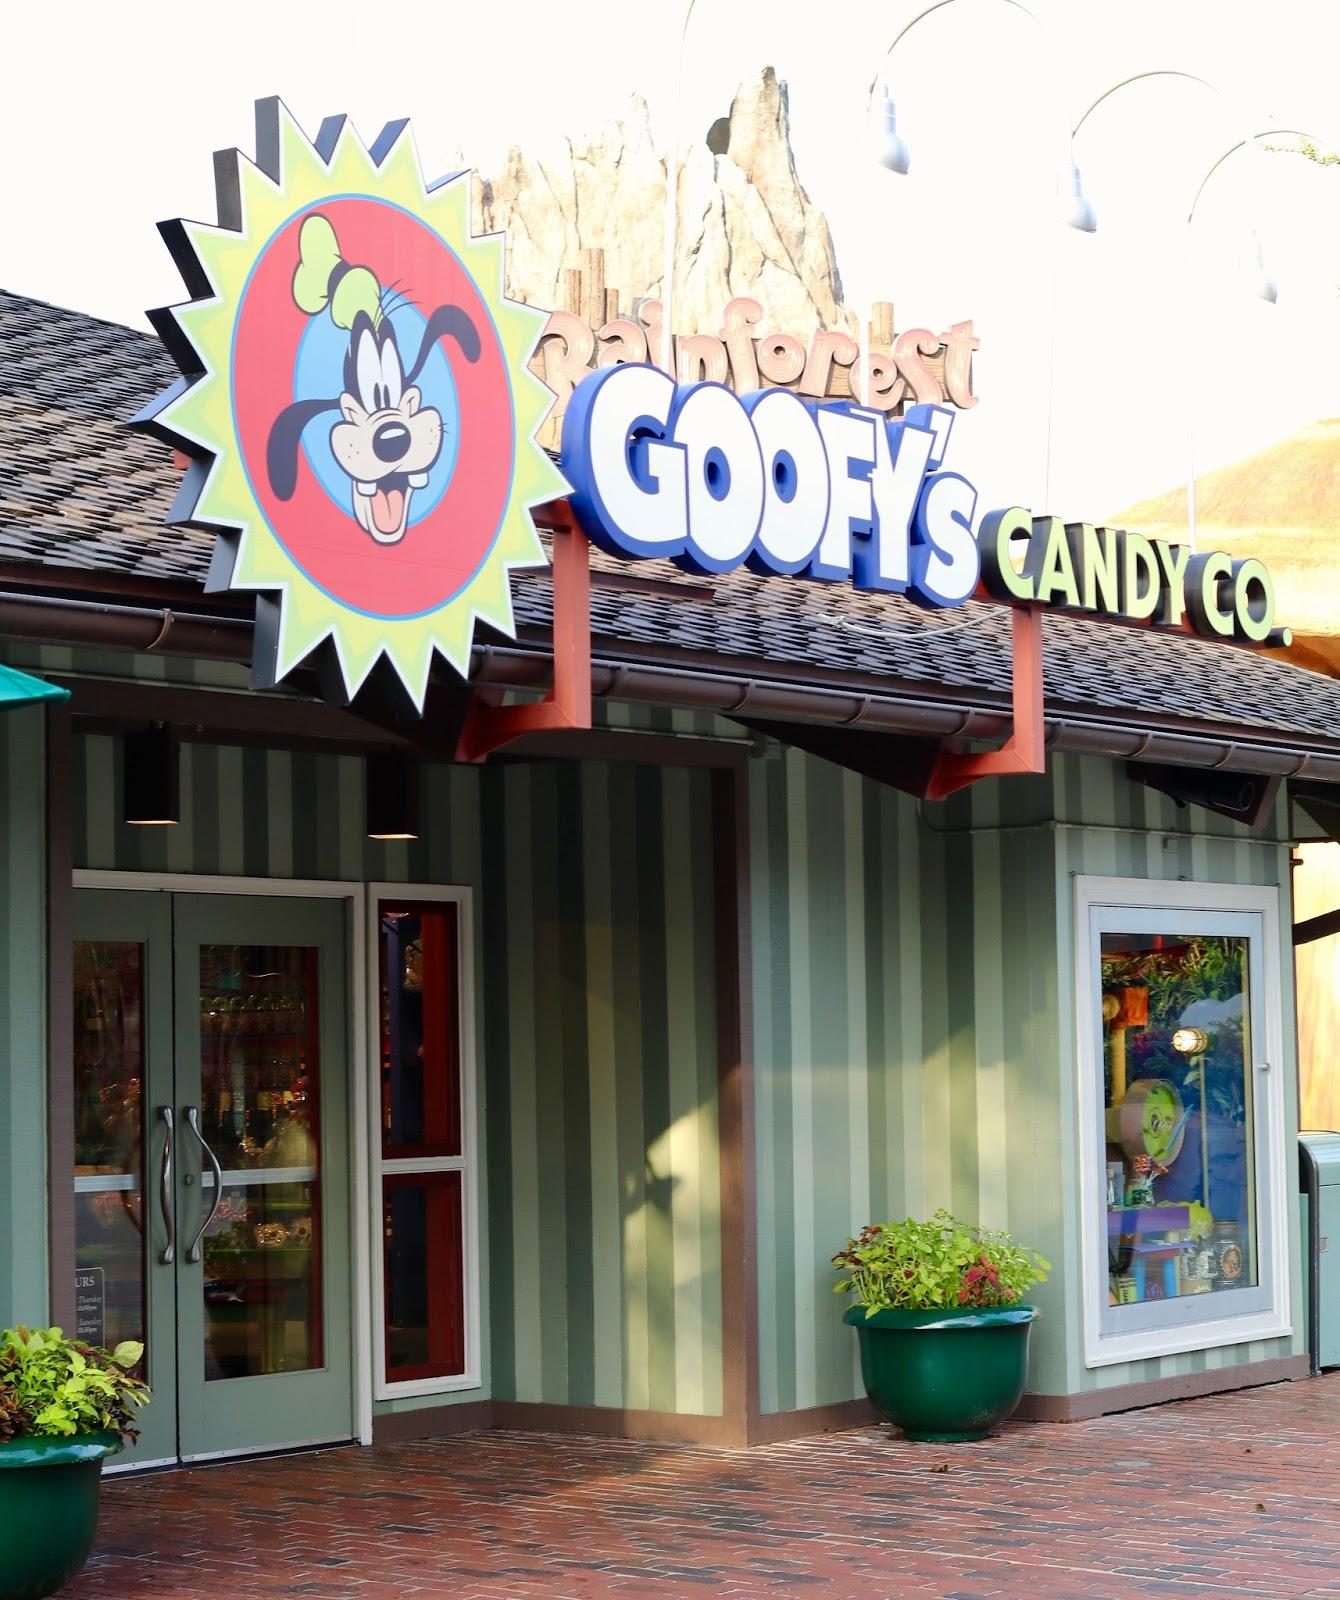 Disney-Spring-Goofy-Company-Candy-Store-Orlando-Florida